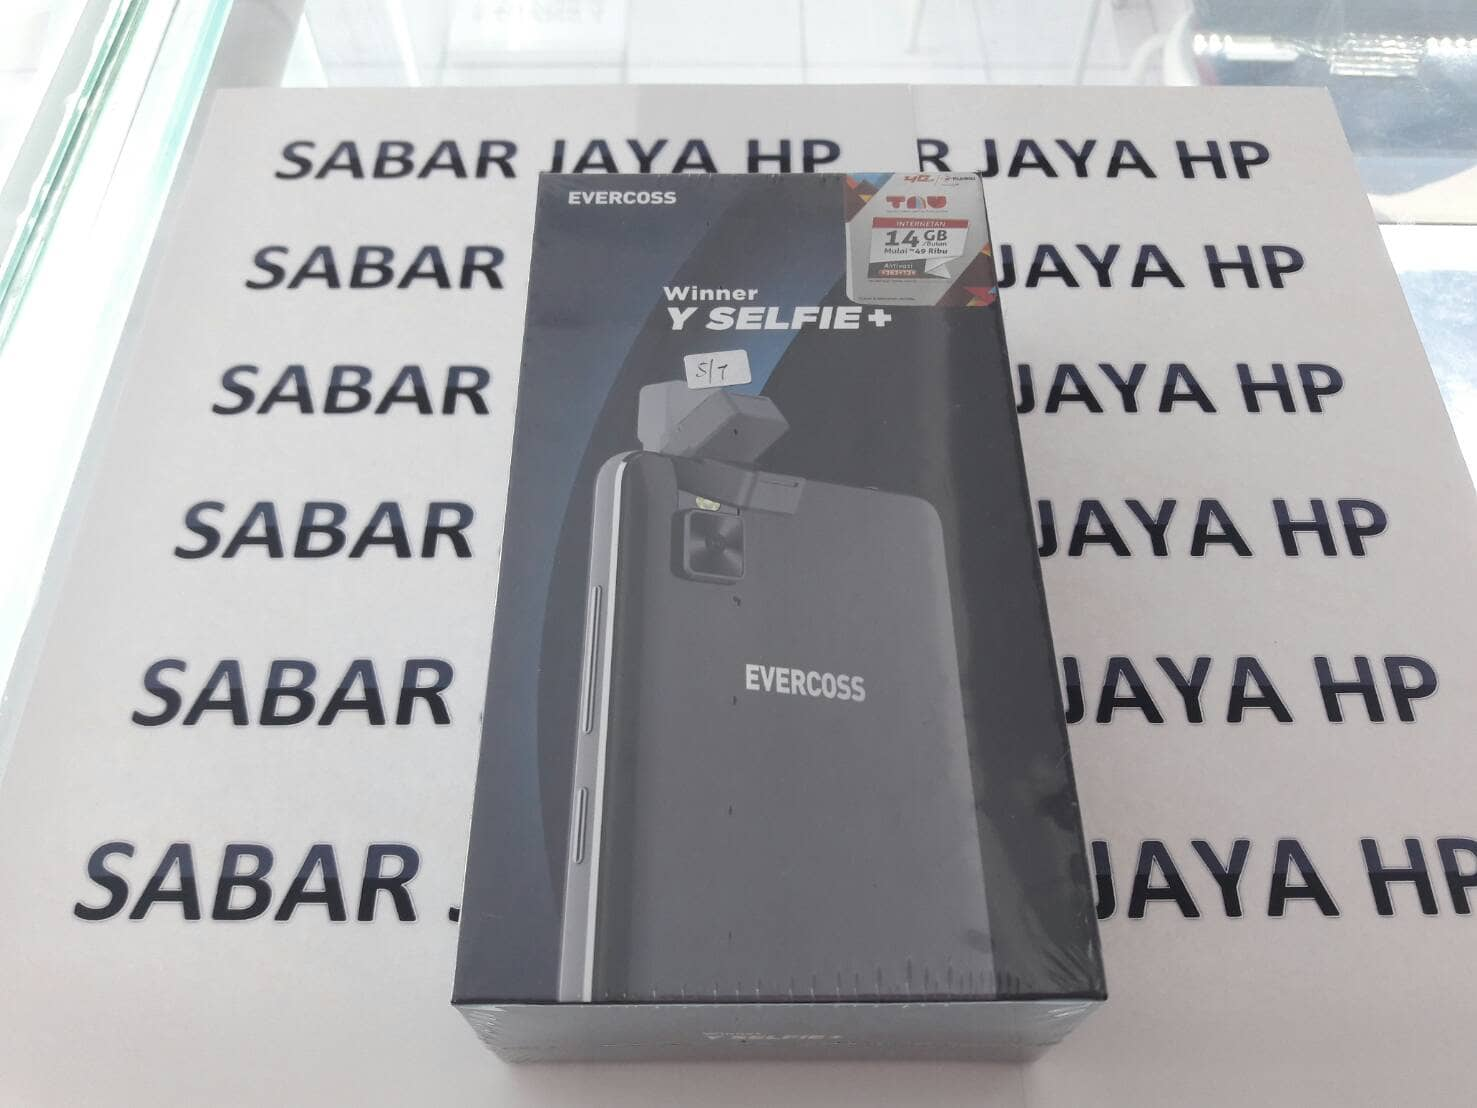 Jual New Evercoss U50c Winner Y Selfie Plus Ponselkuat Tokopedia Evercross